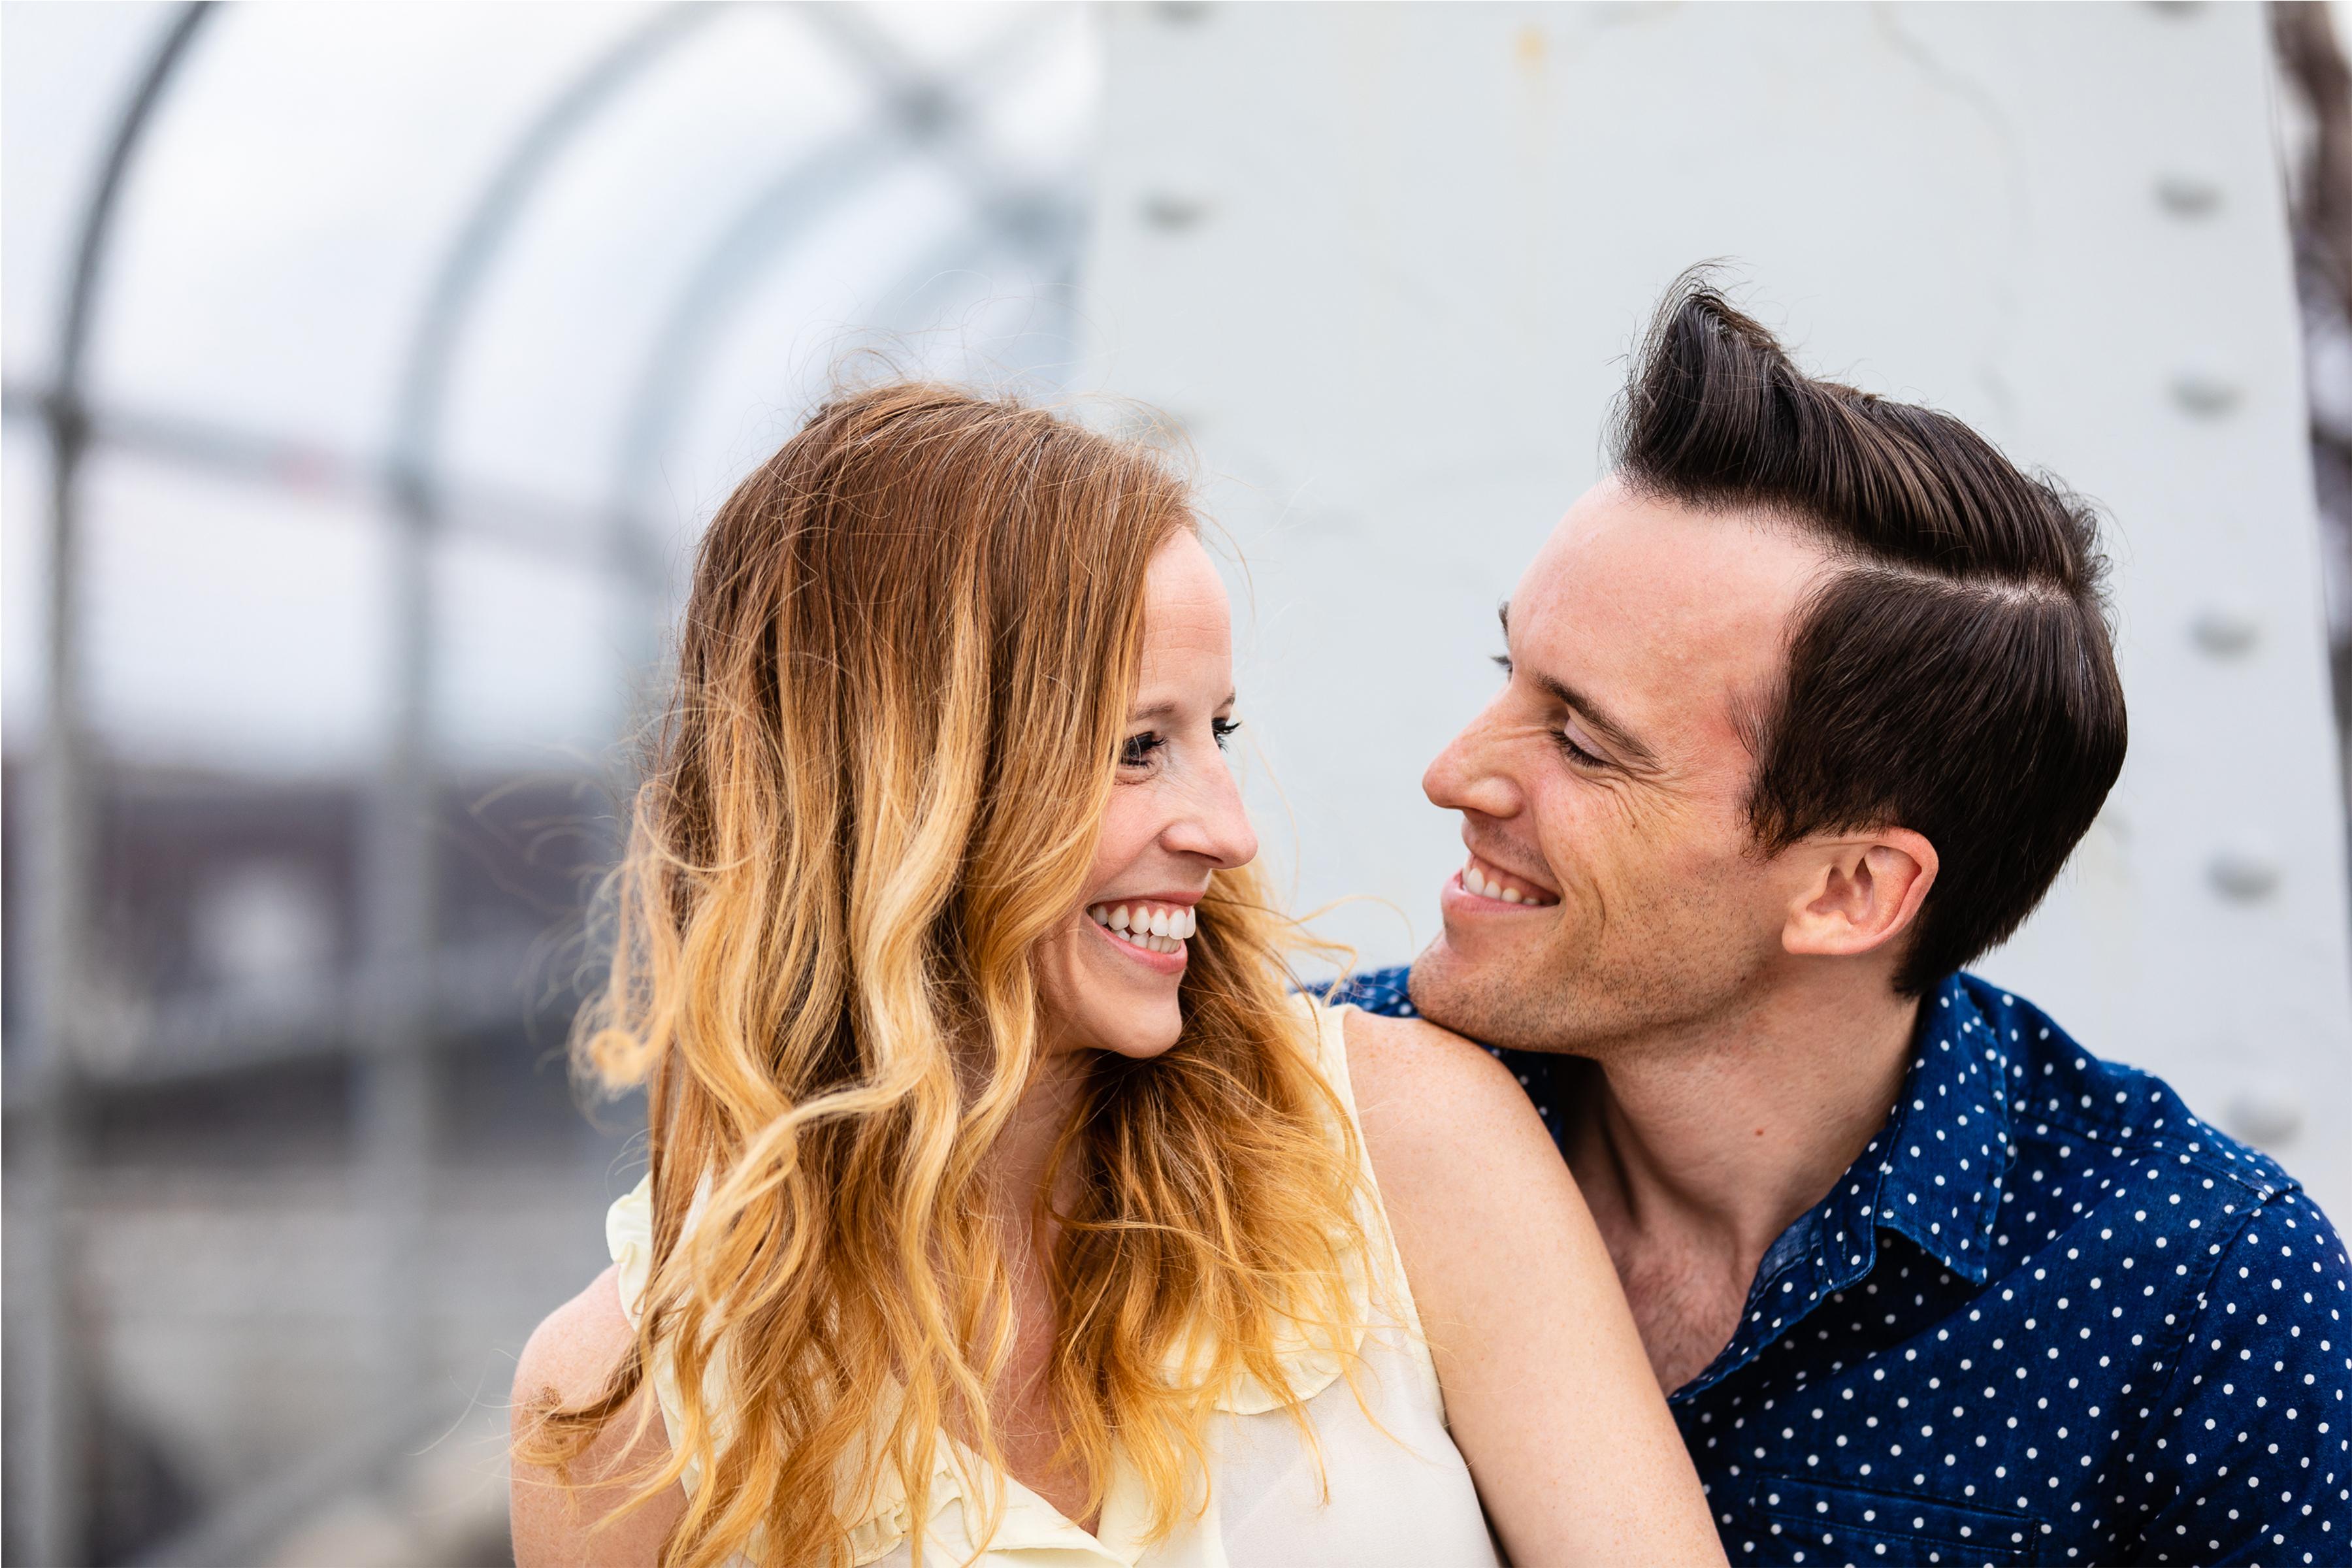 Kristen dating Manitoba ansluta vakuum slang pool